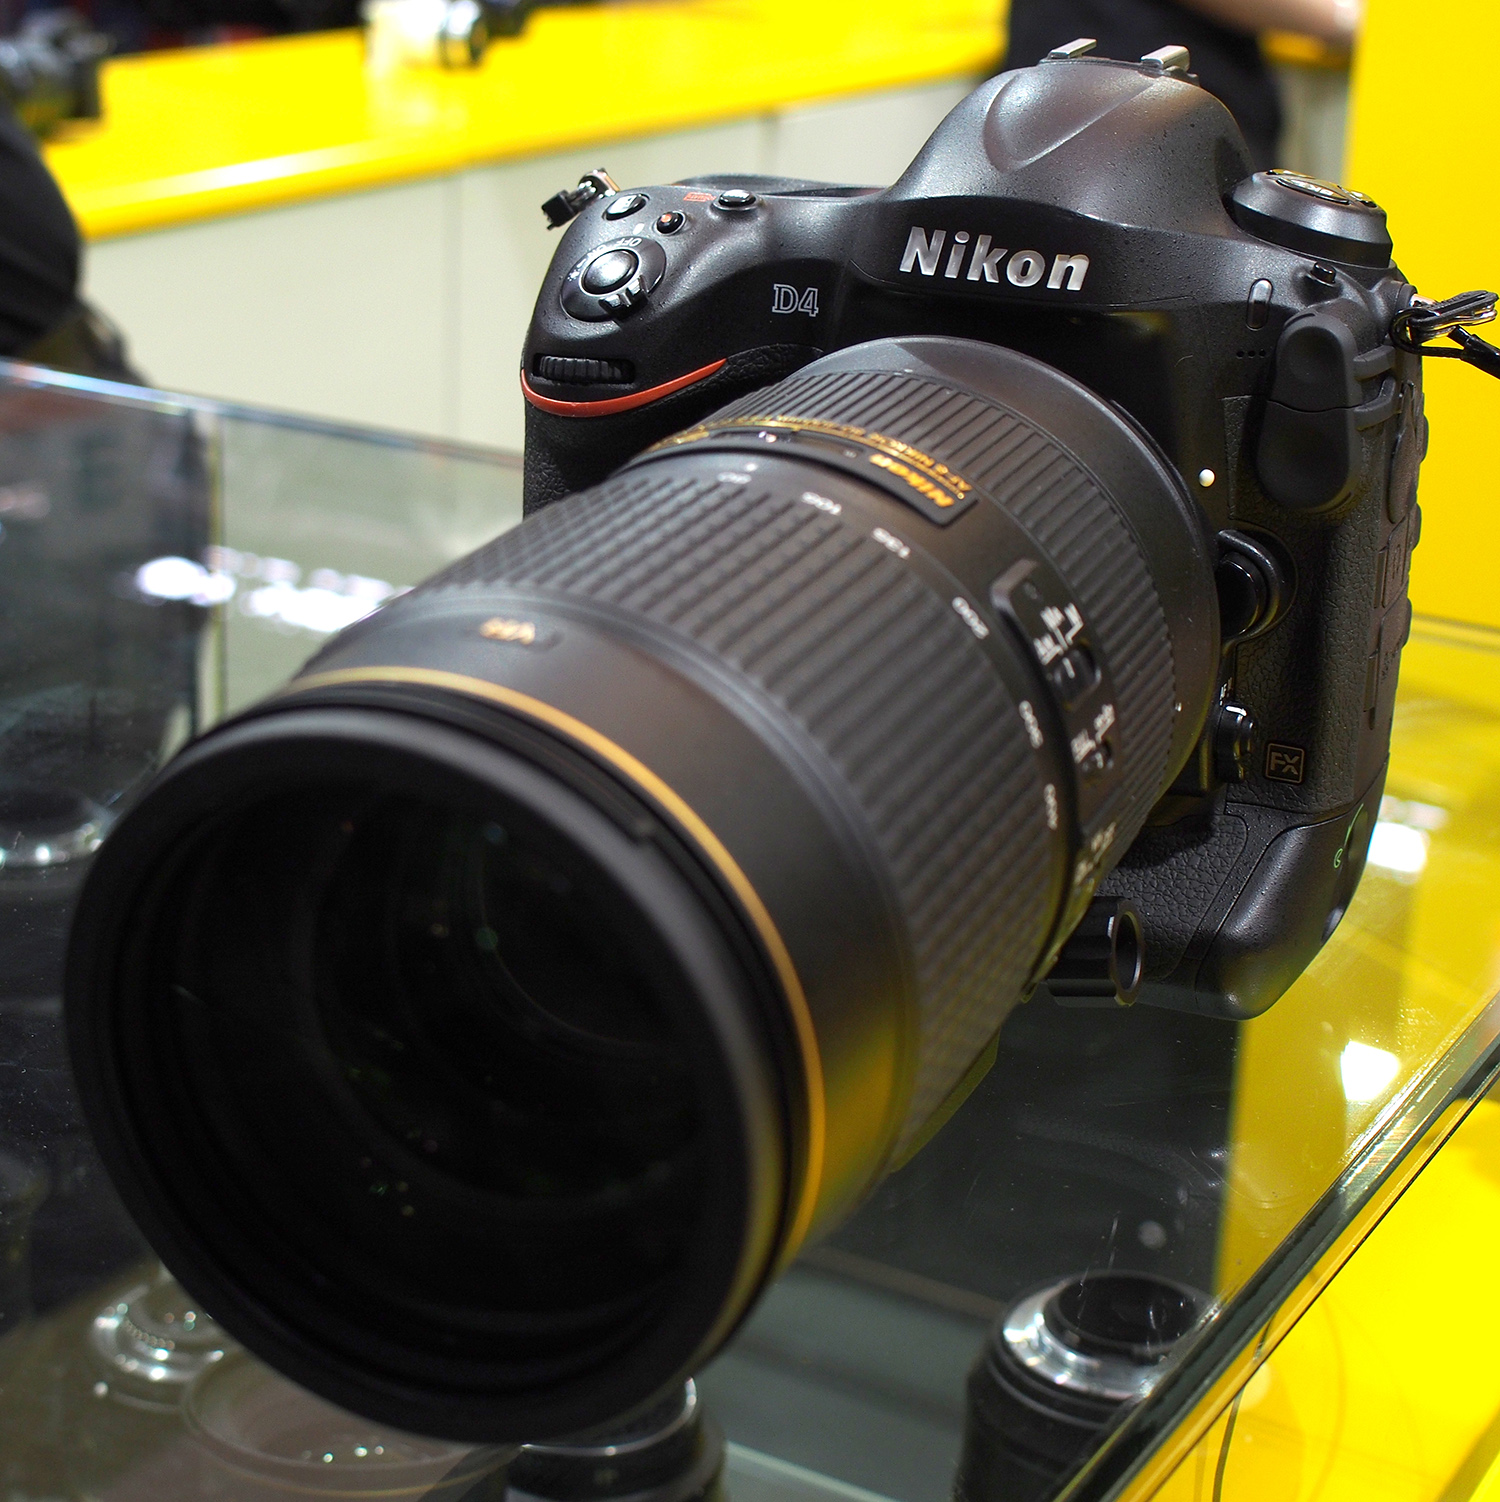 Nikon AF-S 80-400mm f/4.5-5.6 G ED VR : Caratteristiche e ...